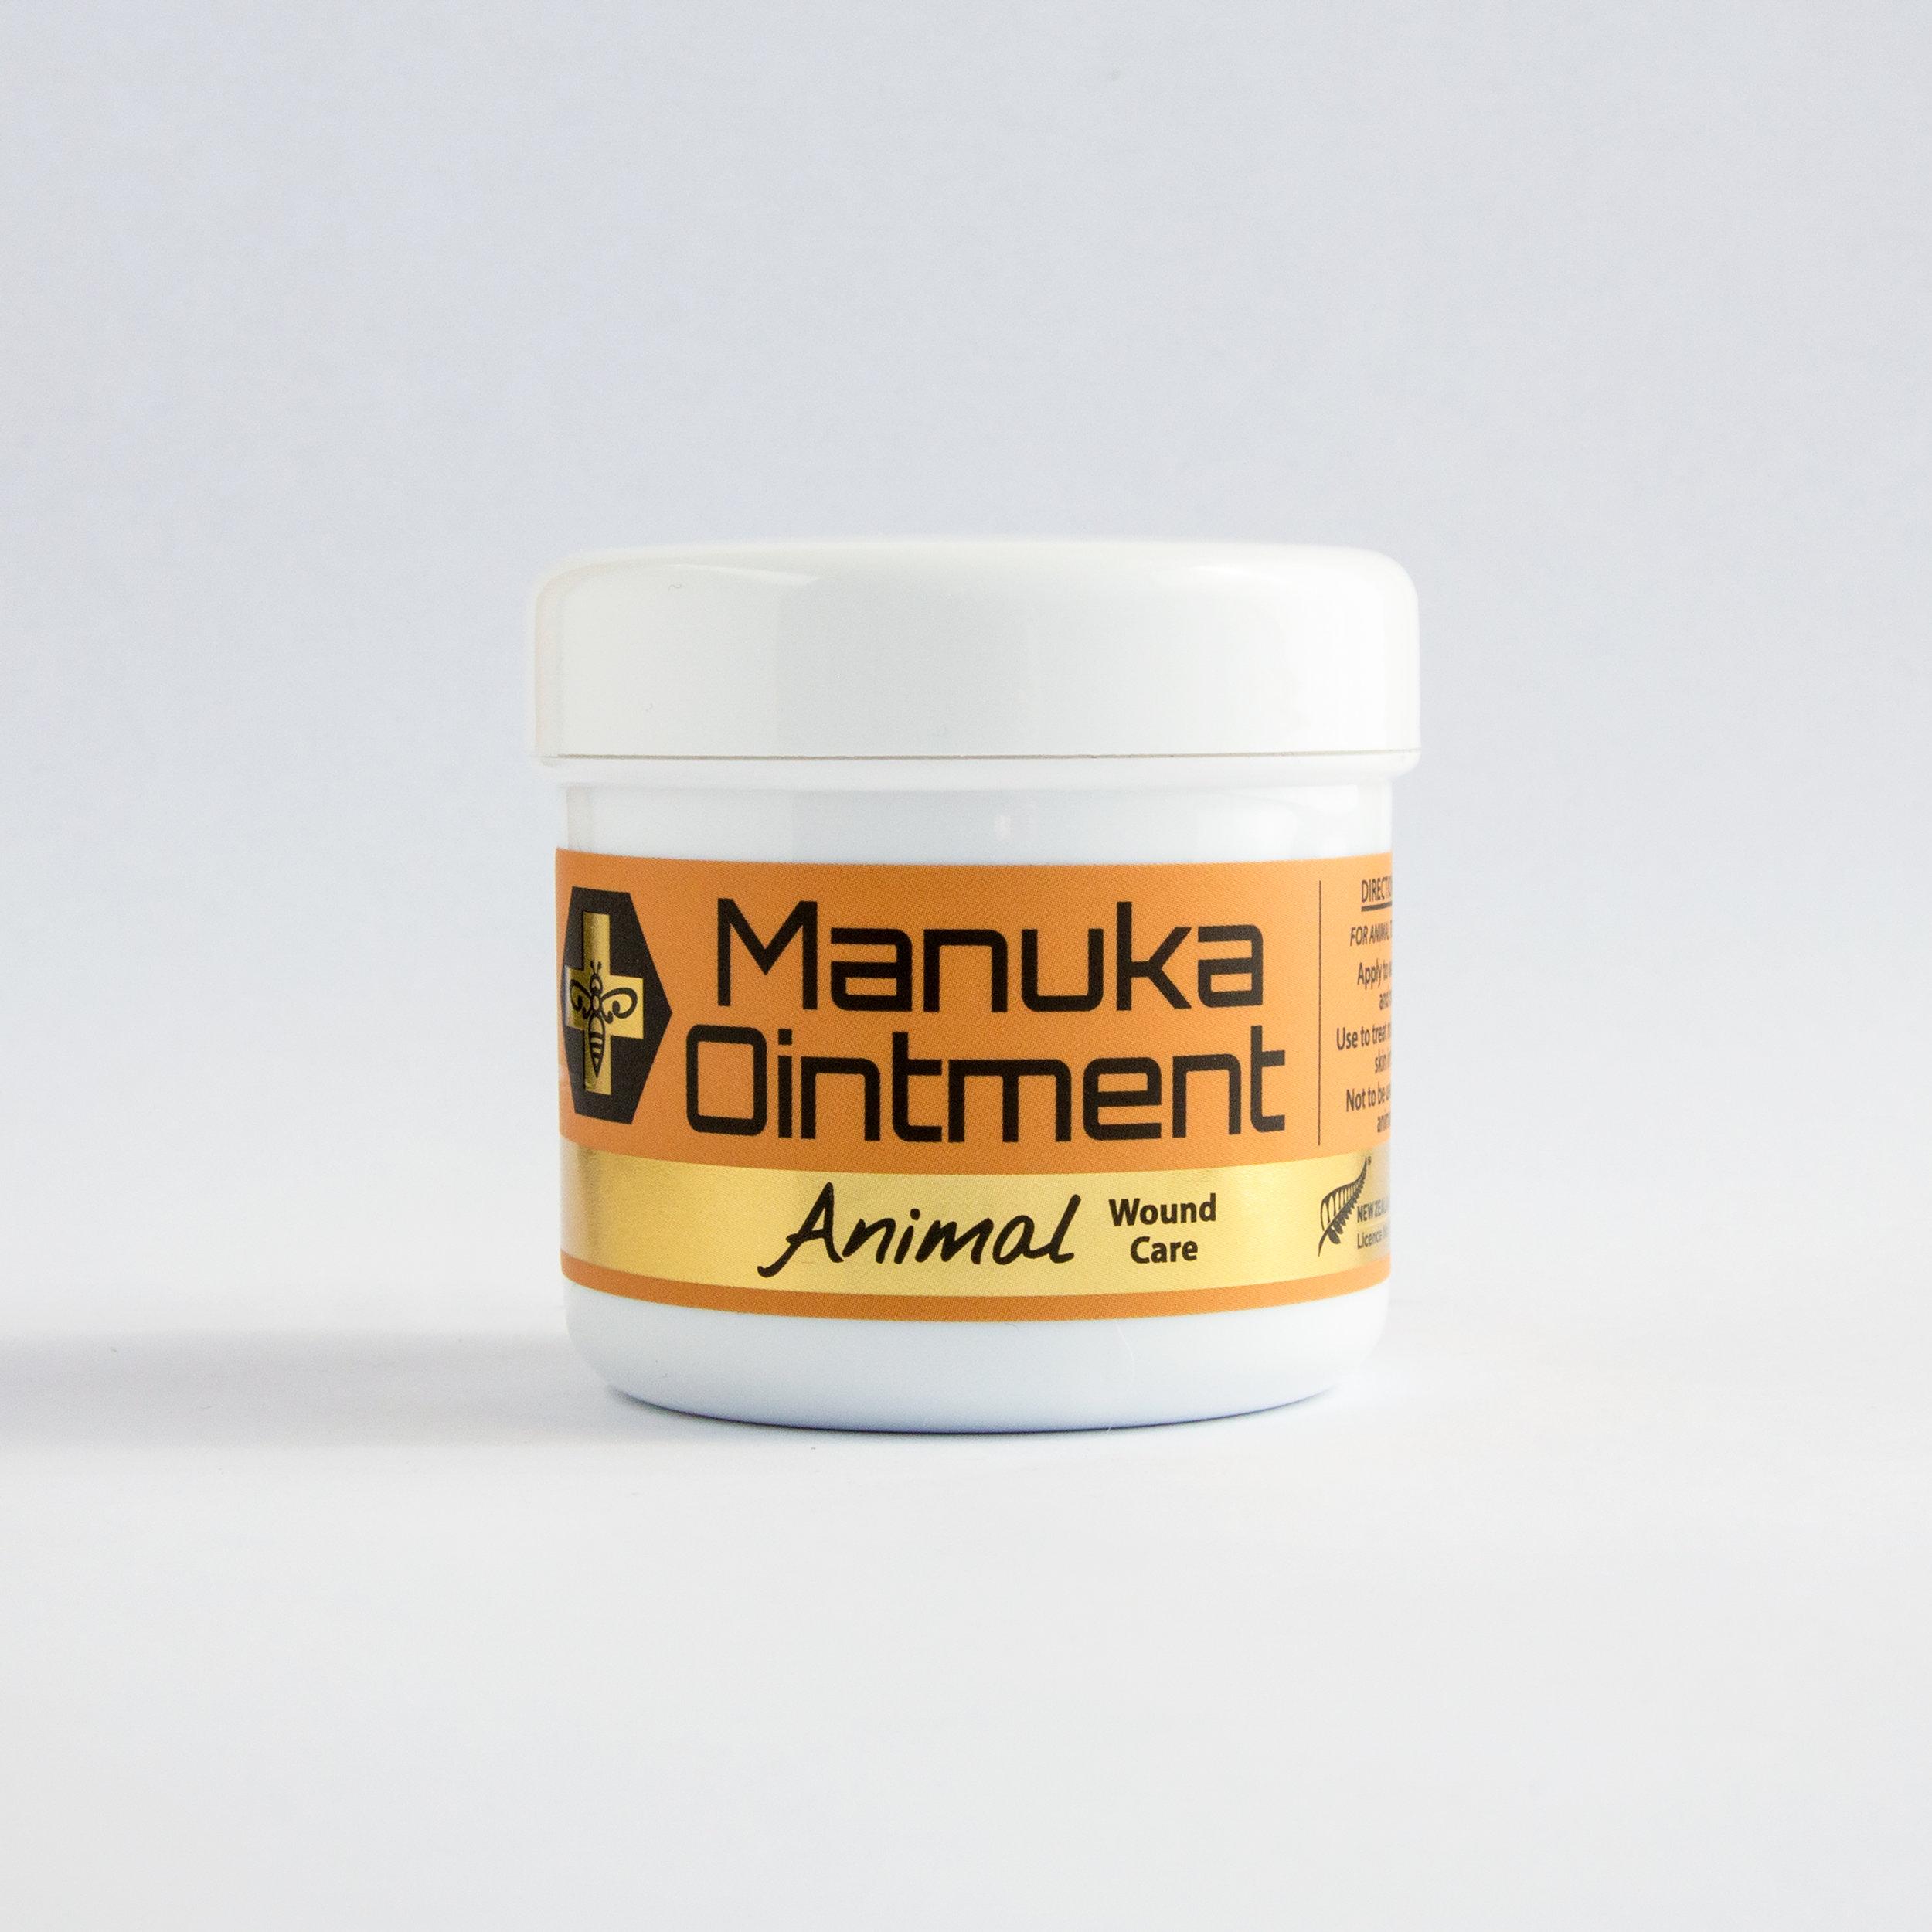 Manuka Ointment Animal Wound Care